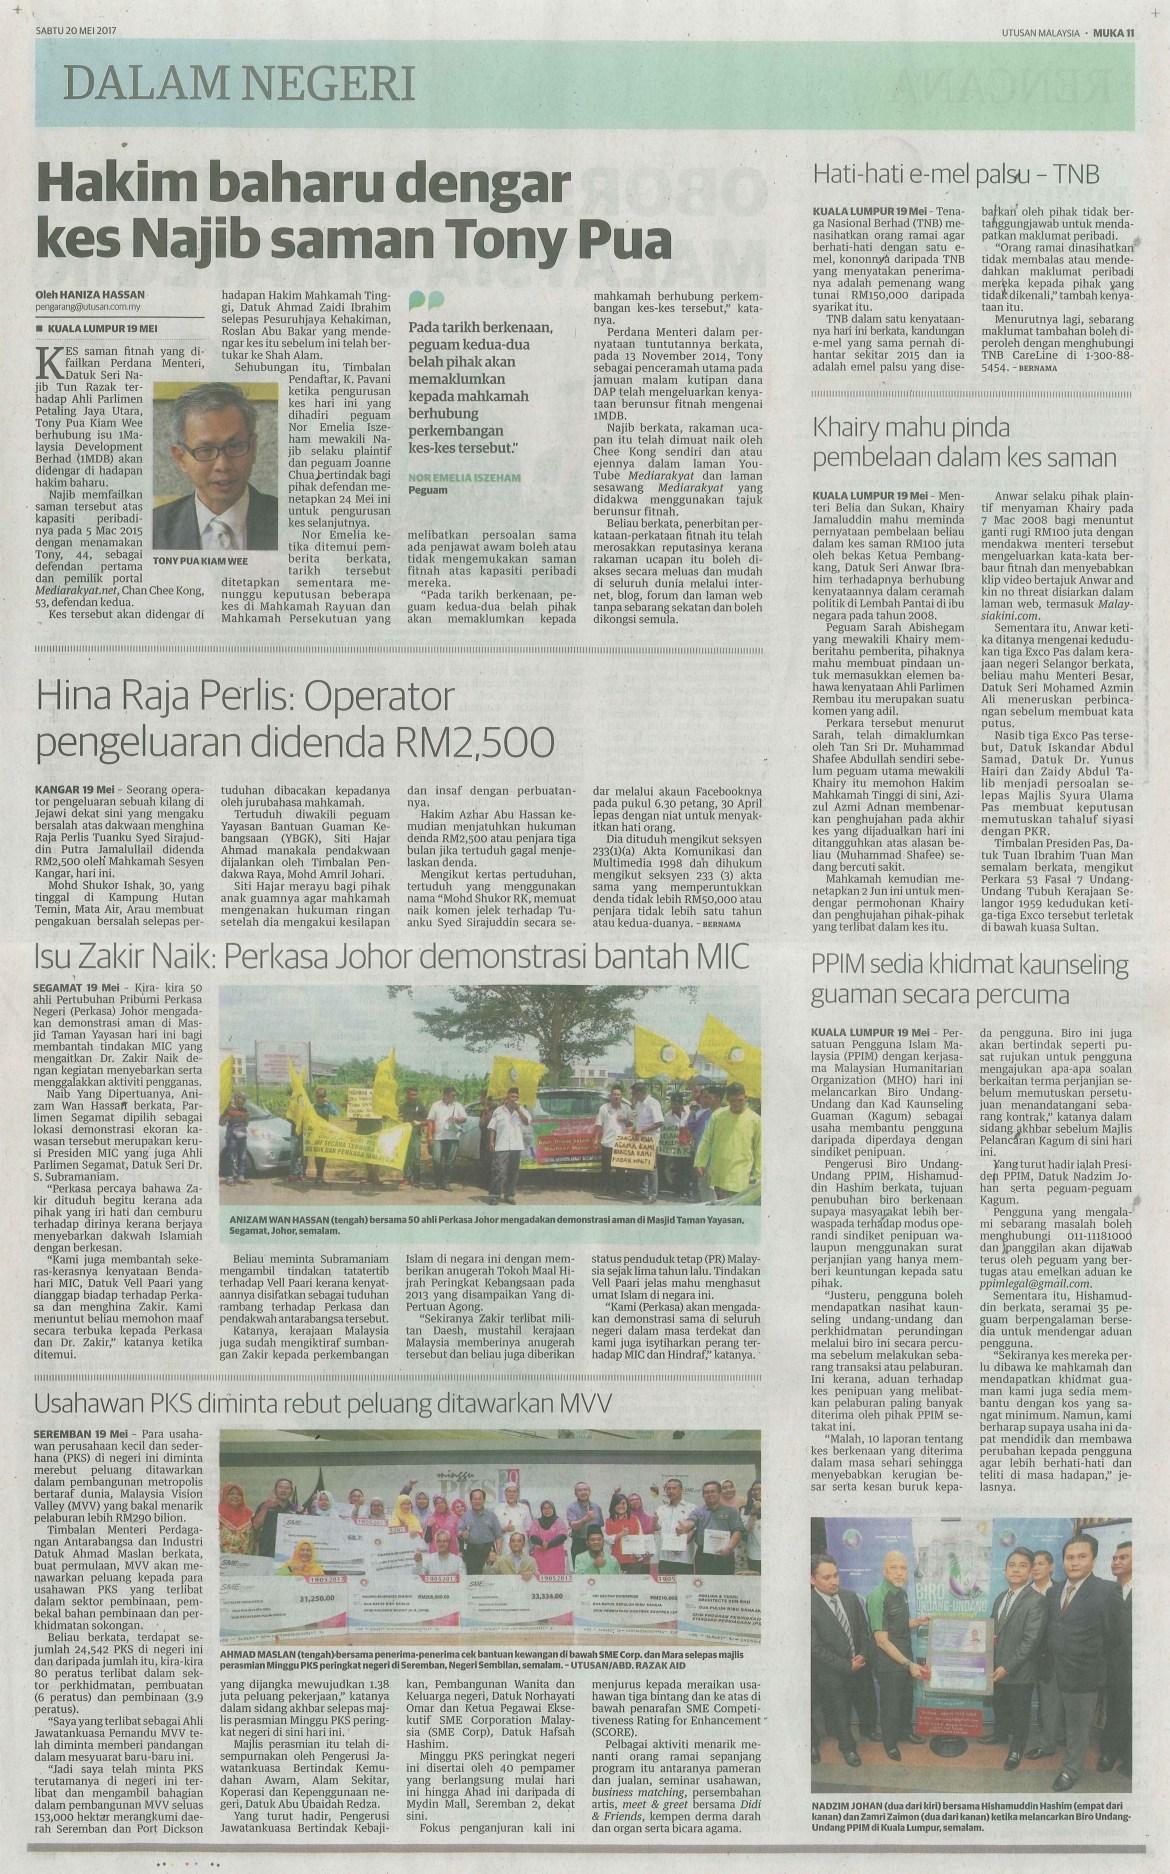 utusan malaysia 20.5.2017